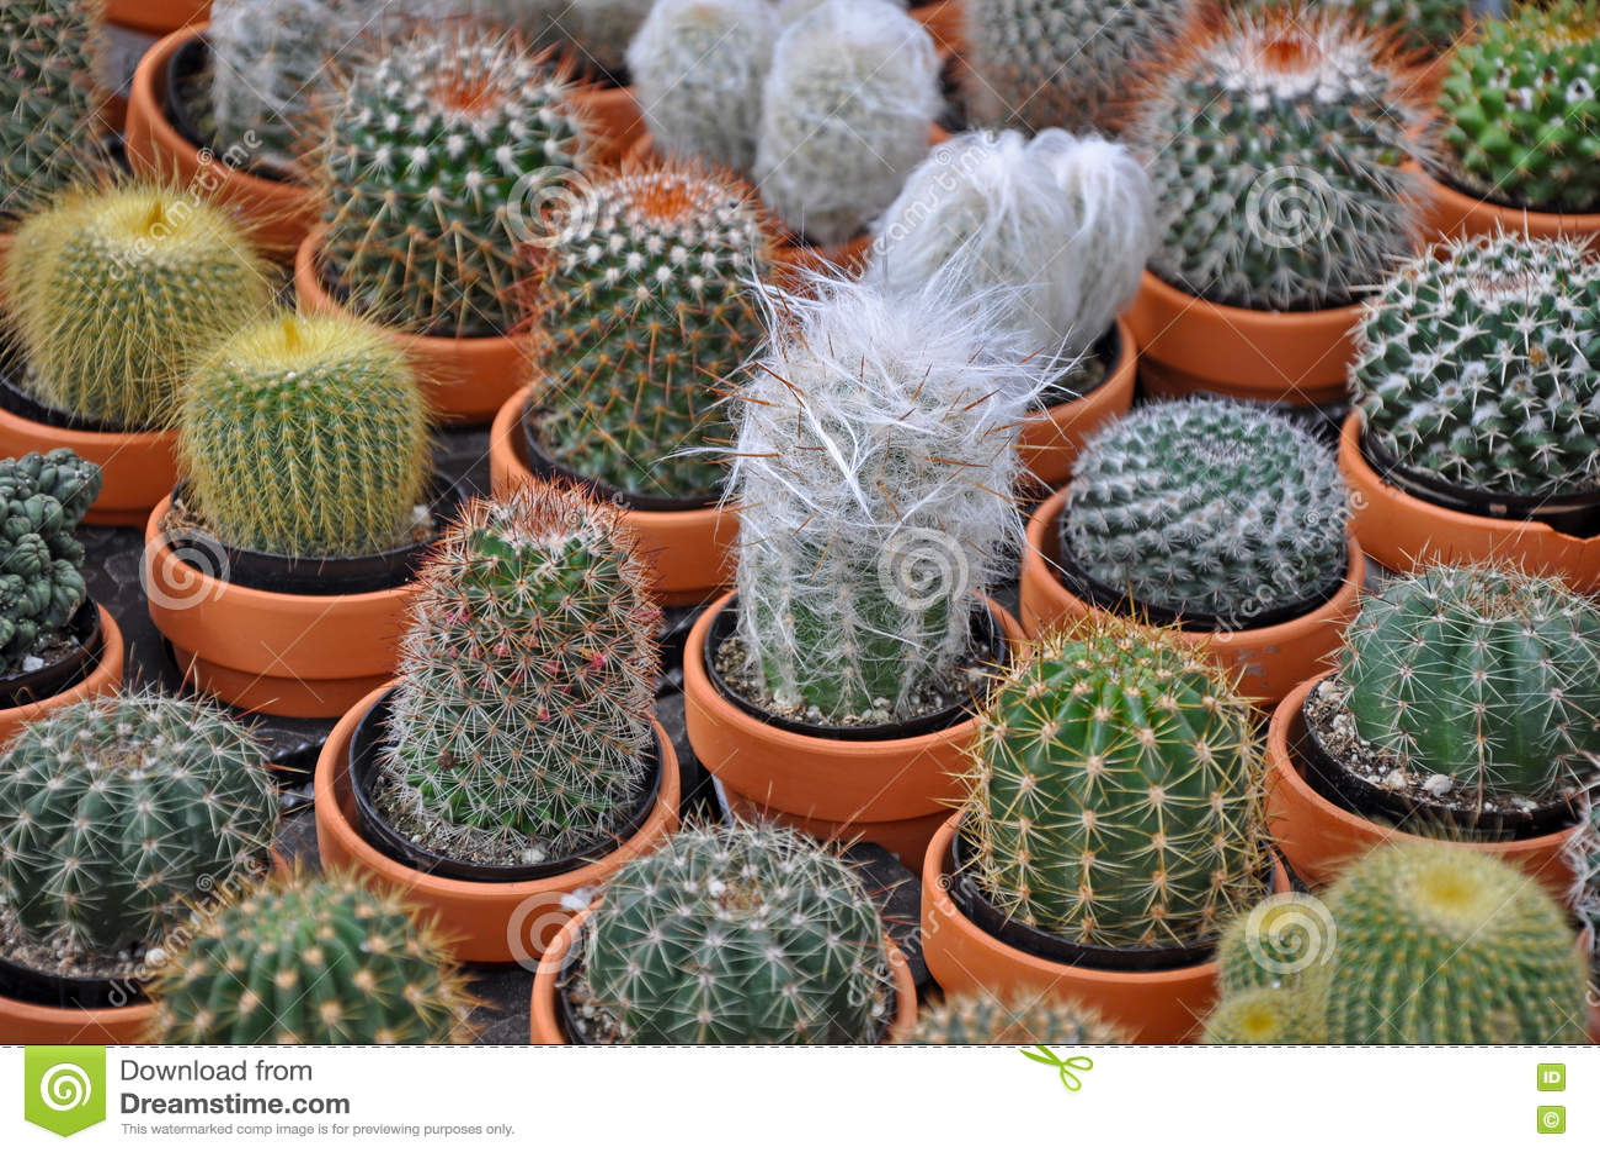 assorted cacti planter royalty free stock image. Black Bedroom Furniture Sets. Home Design Ideas